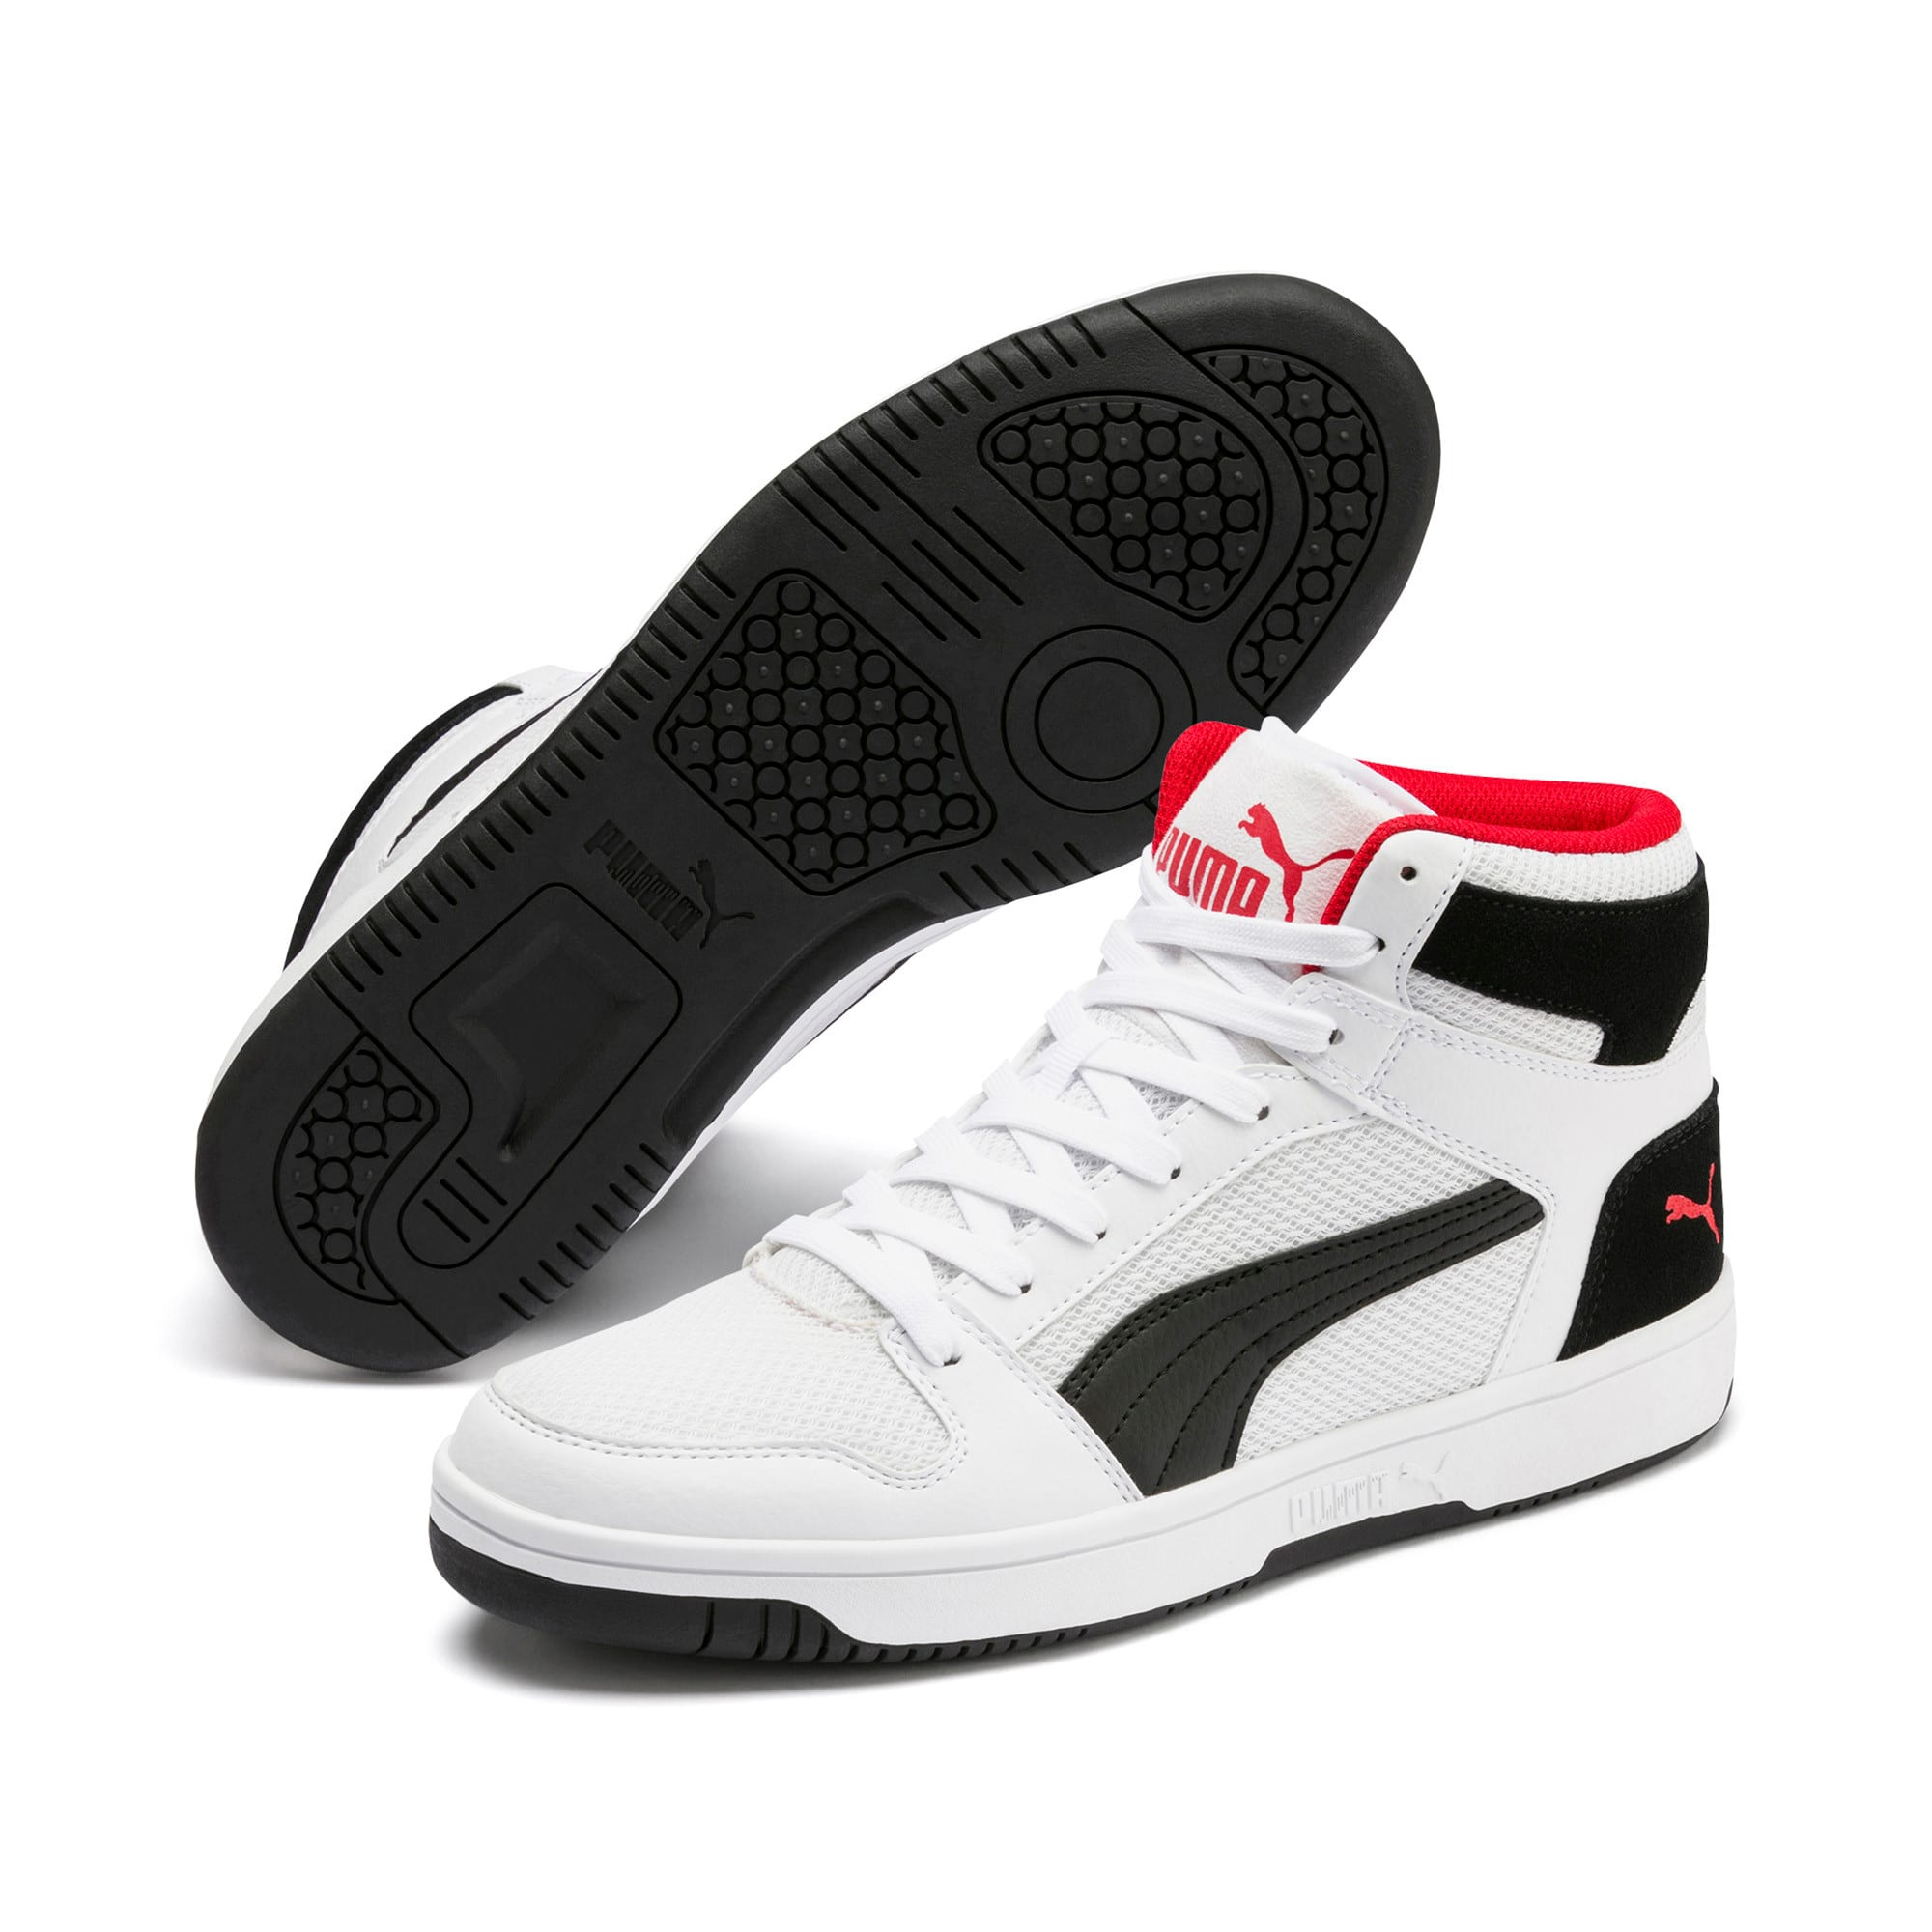 Thumbnail 2 of PUMA Rebound LayUp Mesh Sneakers, White-Black-High Risk Red, medium